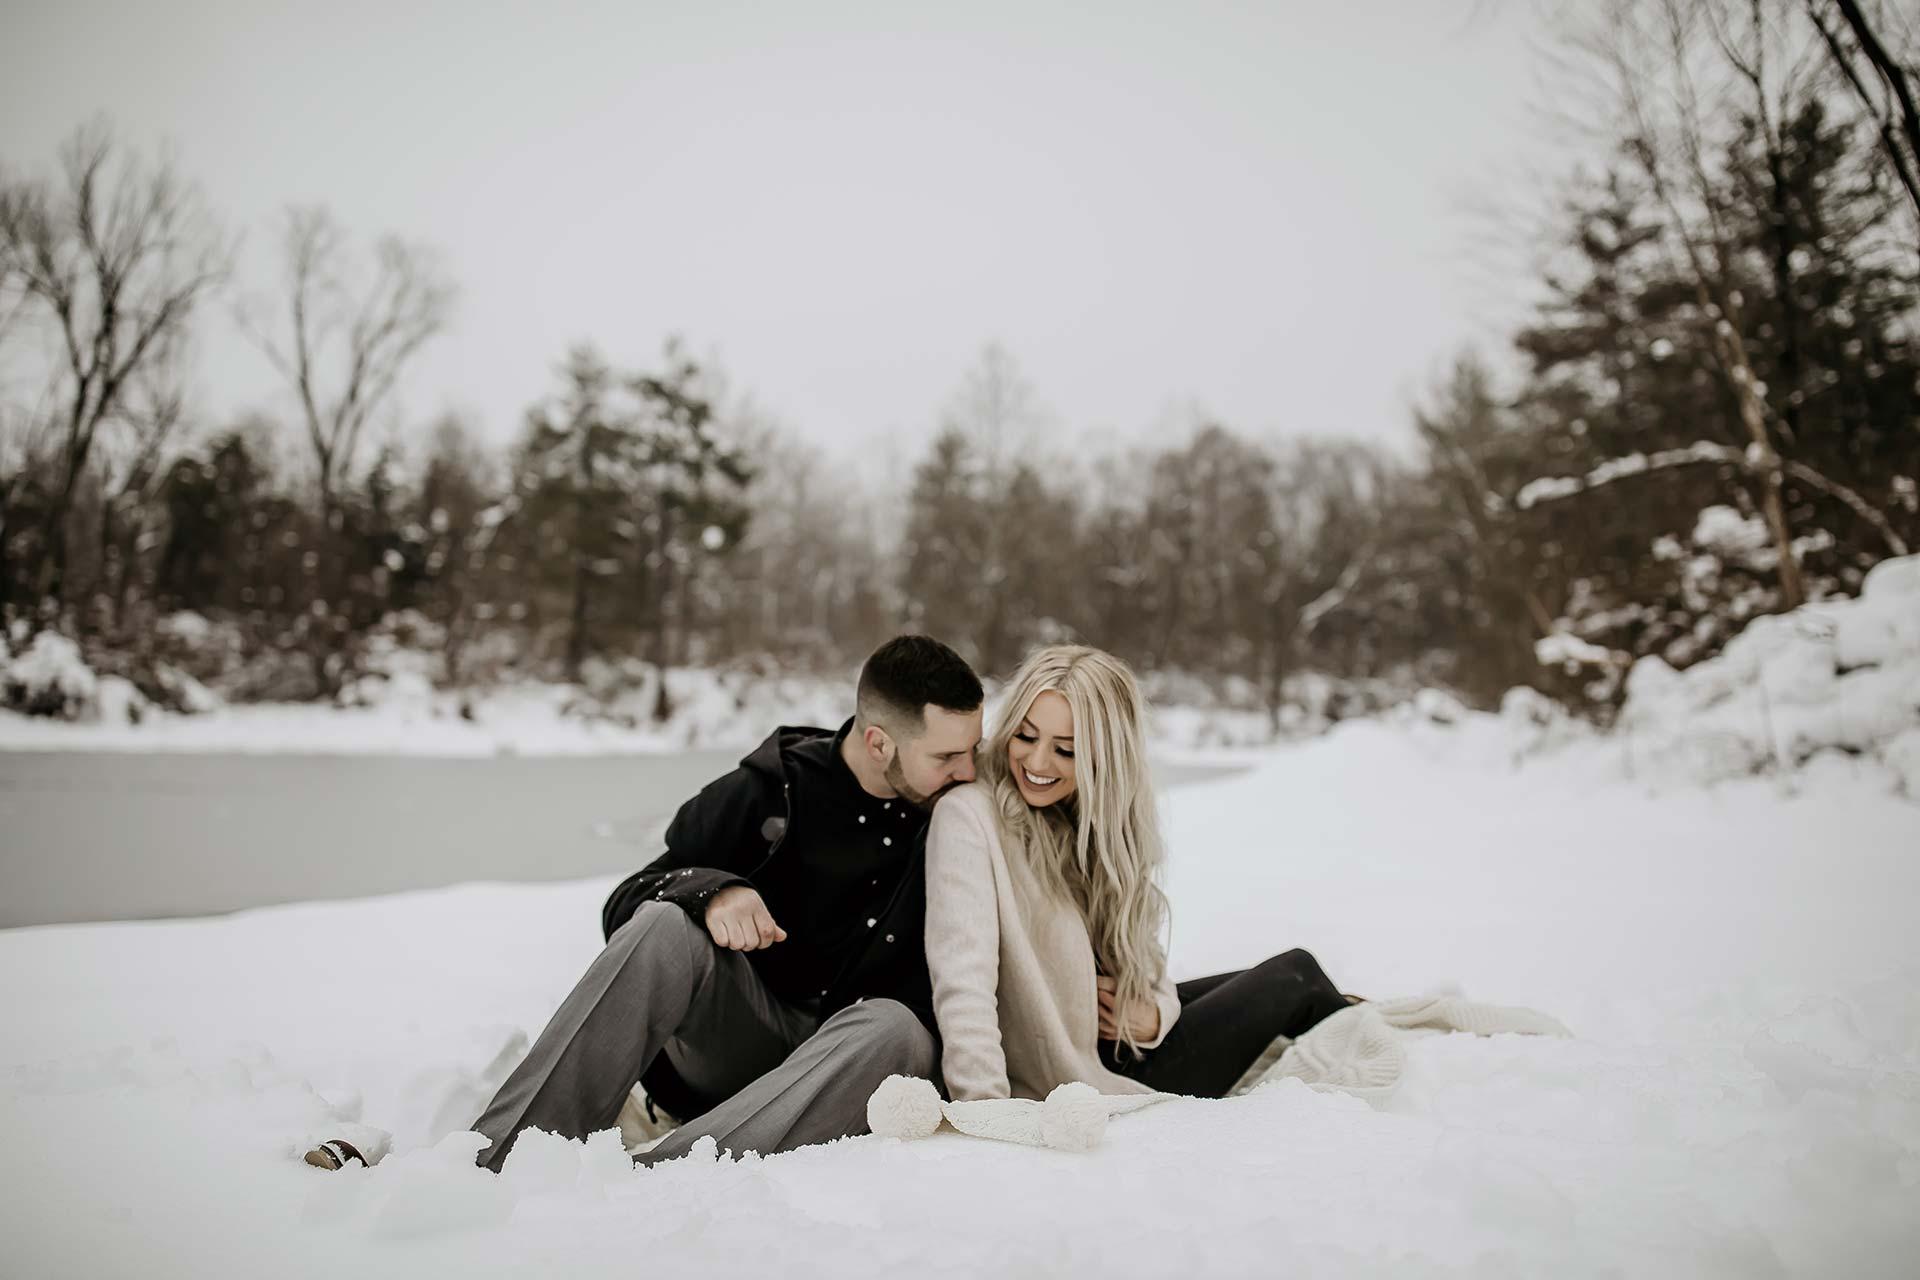 ivy-ink-photography-couple-portrait-snow.jpg